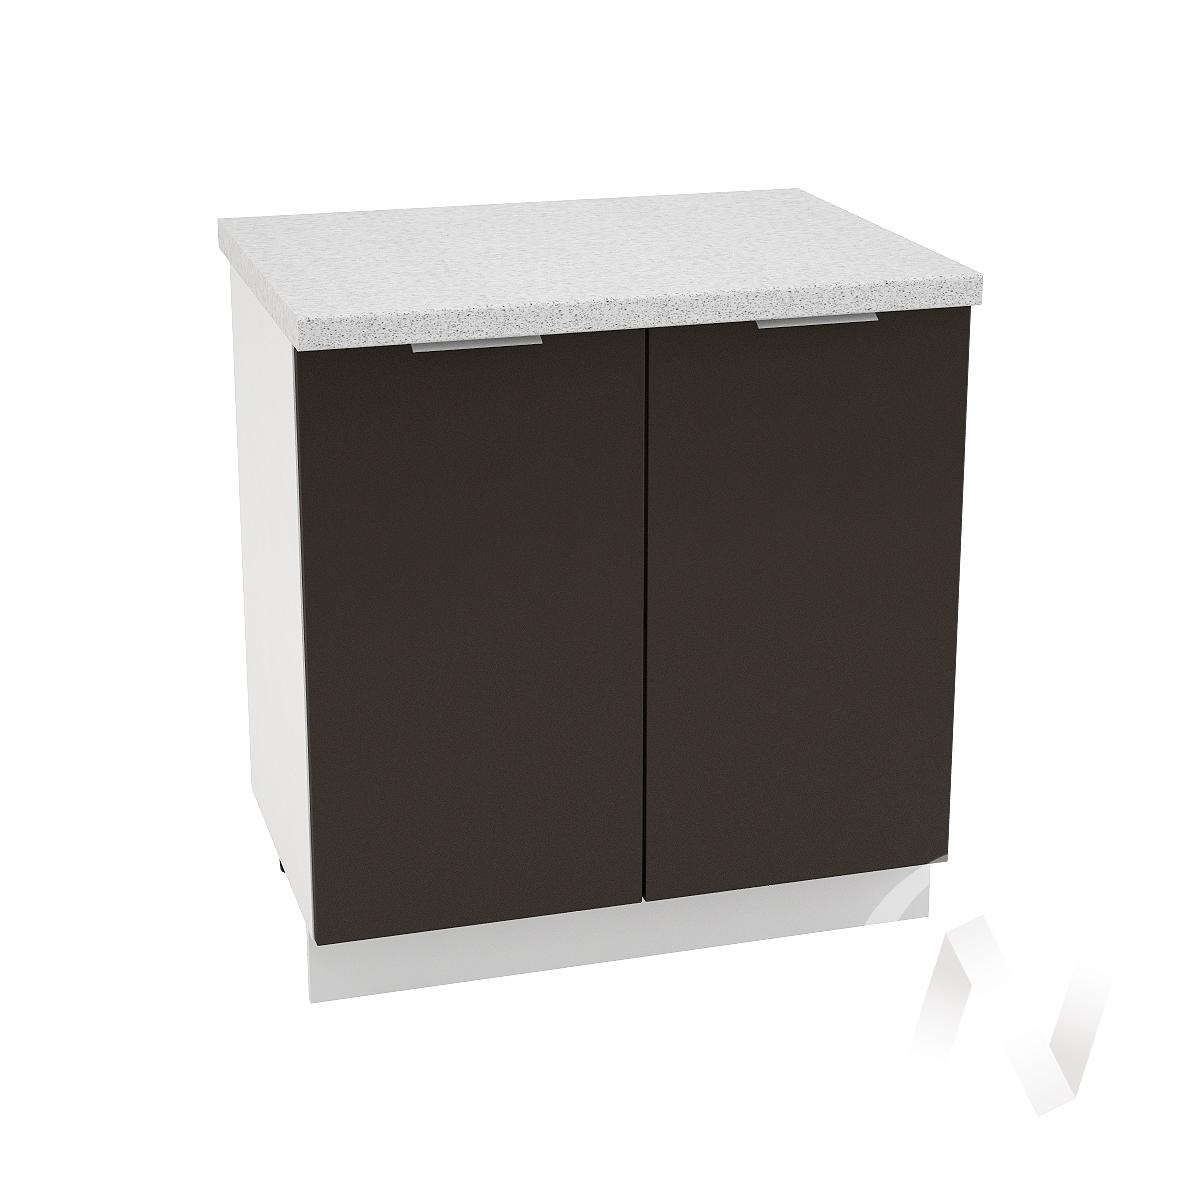 "Кухня ""Терра"": Шкаф нижний 800, ШН 800 (смоки софт/корпус белый)"